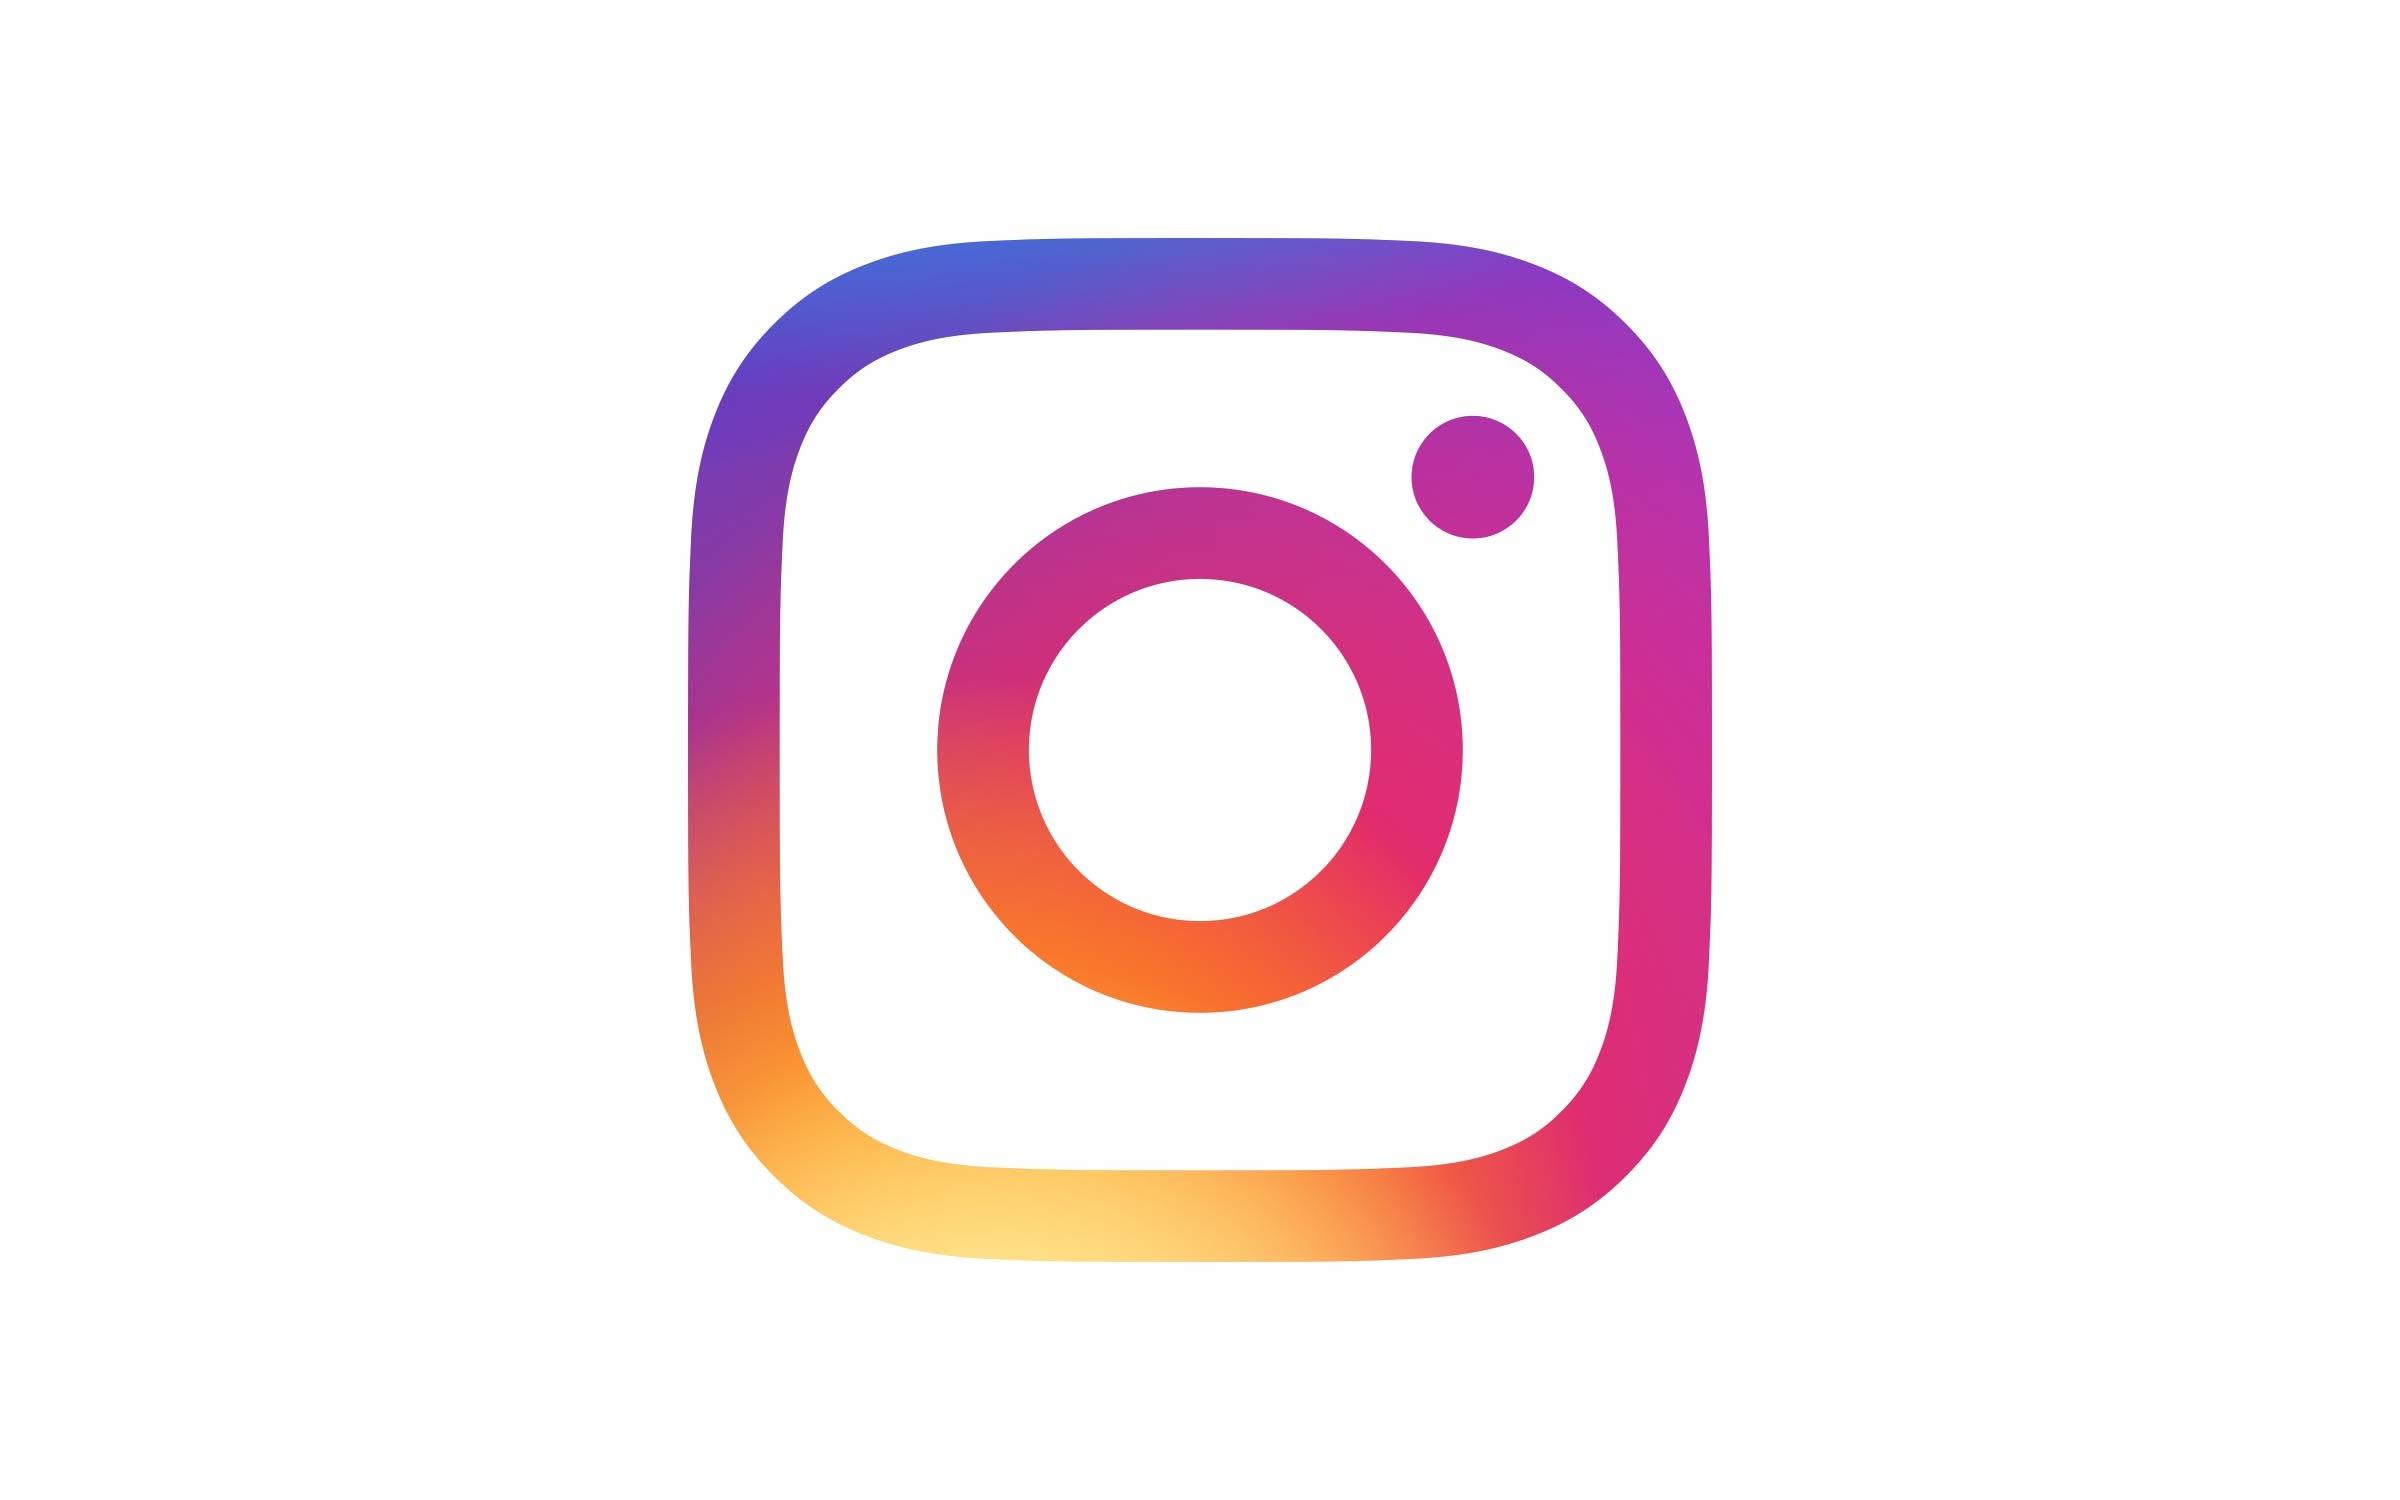 instagramで浮気の証拠を掴む